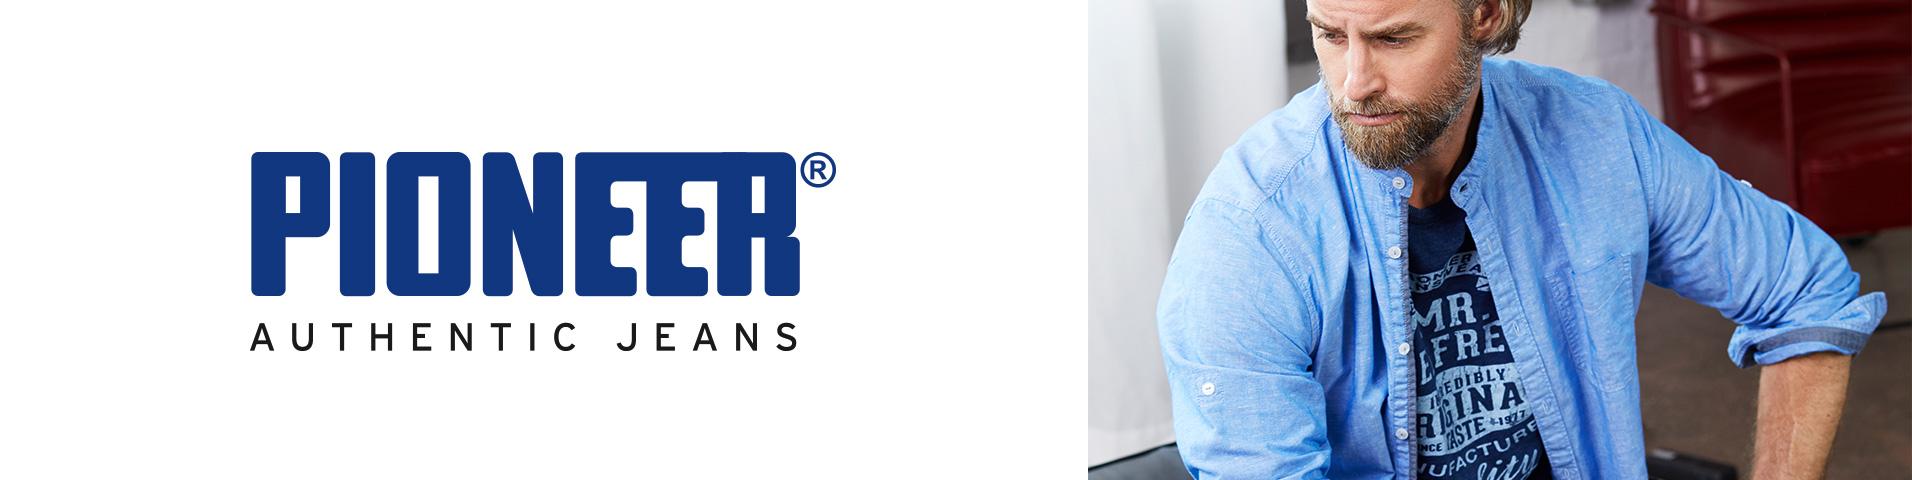 122e4753bea7 Pioneer Authentic Jeans Herrenmode Online Shop - Alles für Männer ...